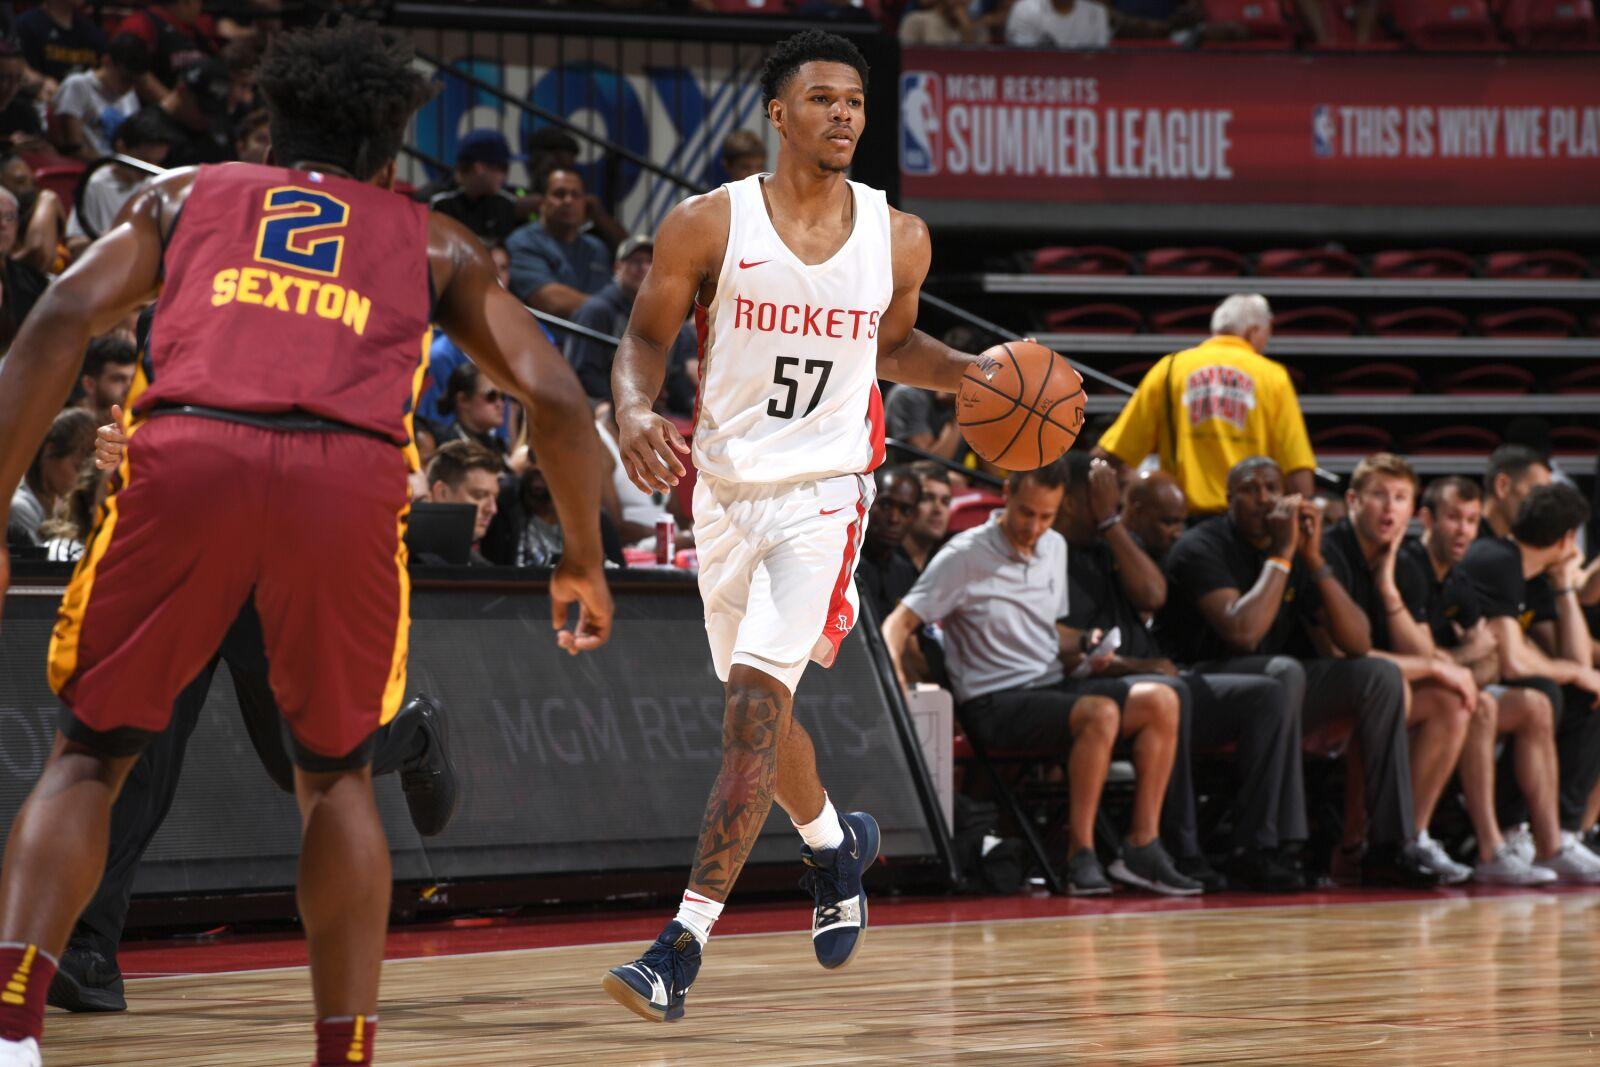 244824b8f3d Game recap: Cleveland Cavaliers advance to LVSL quarterfinals